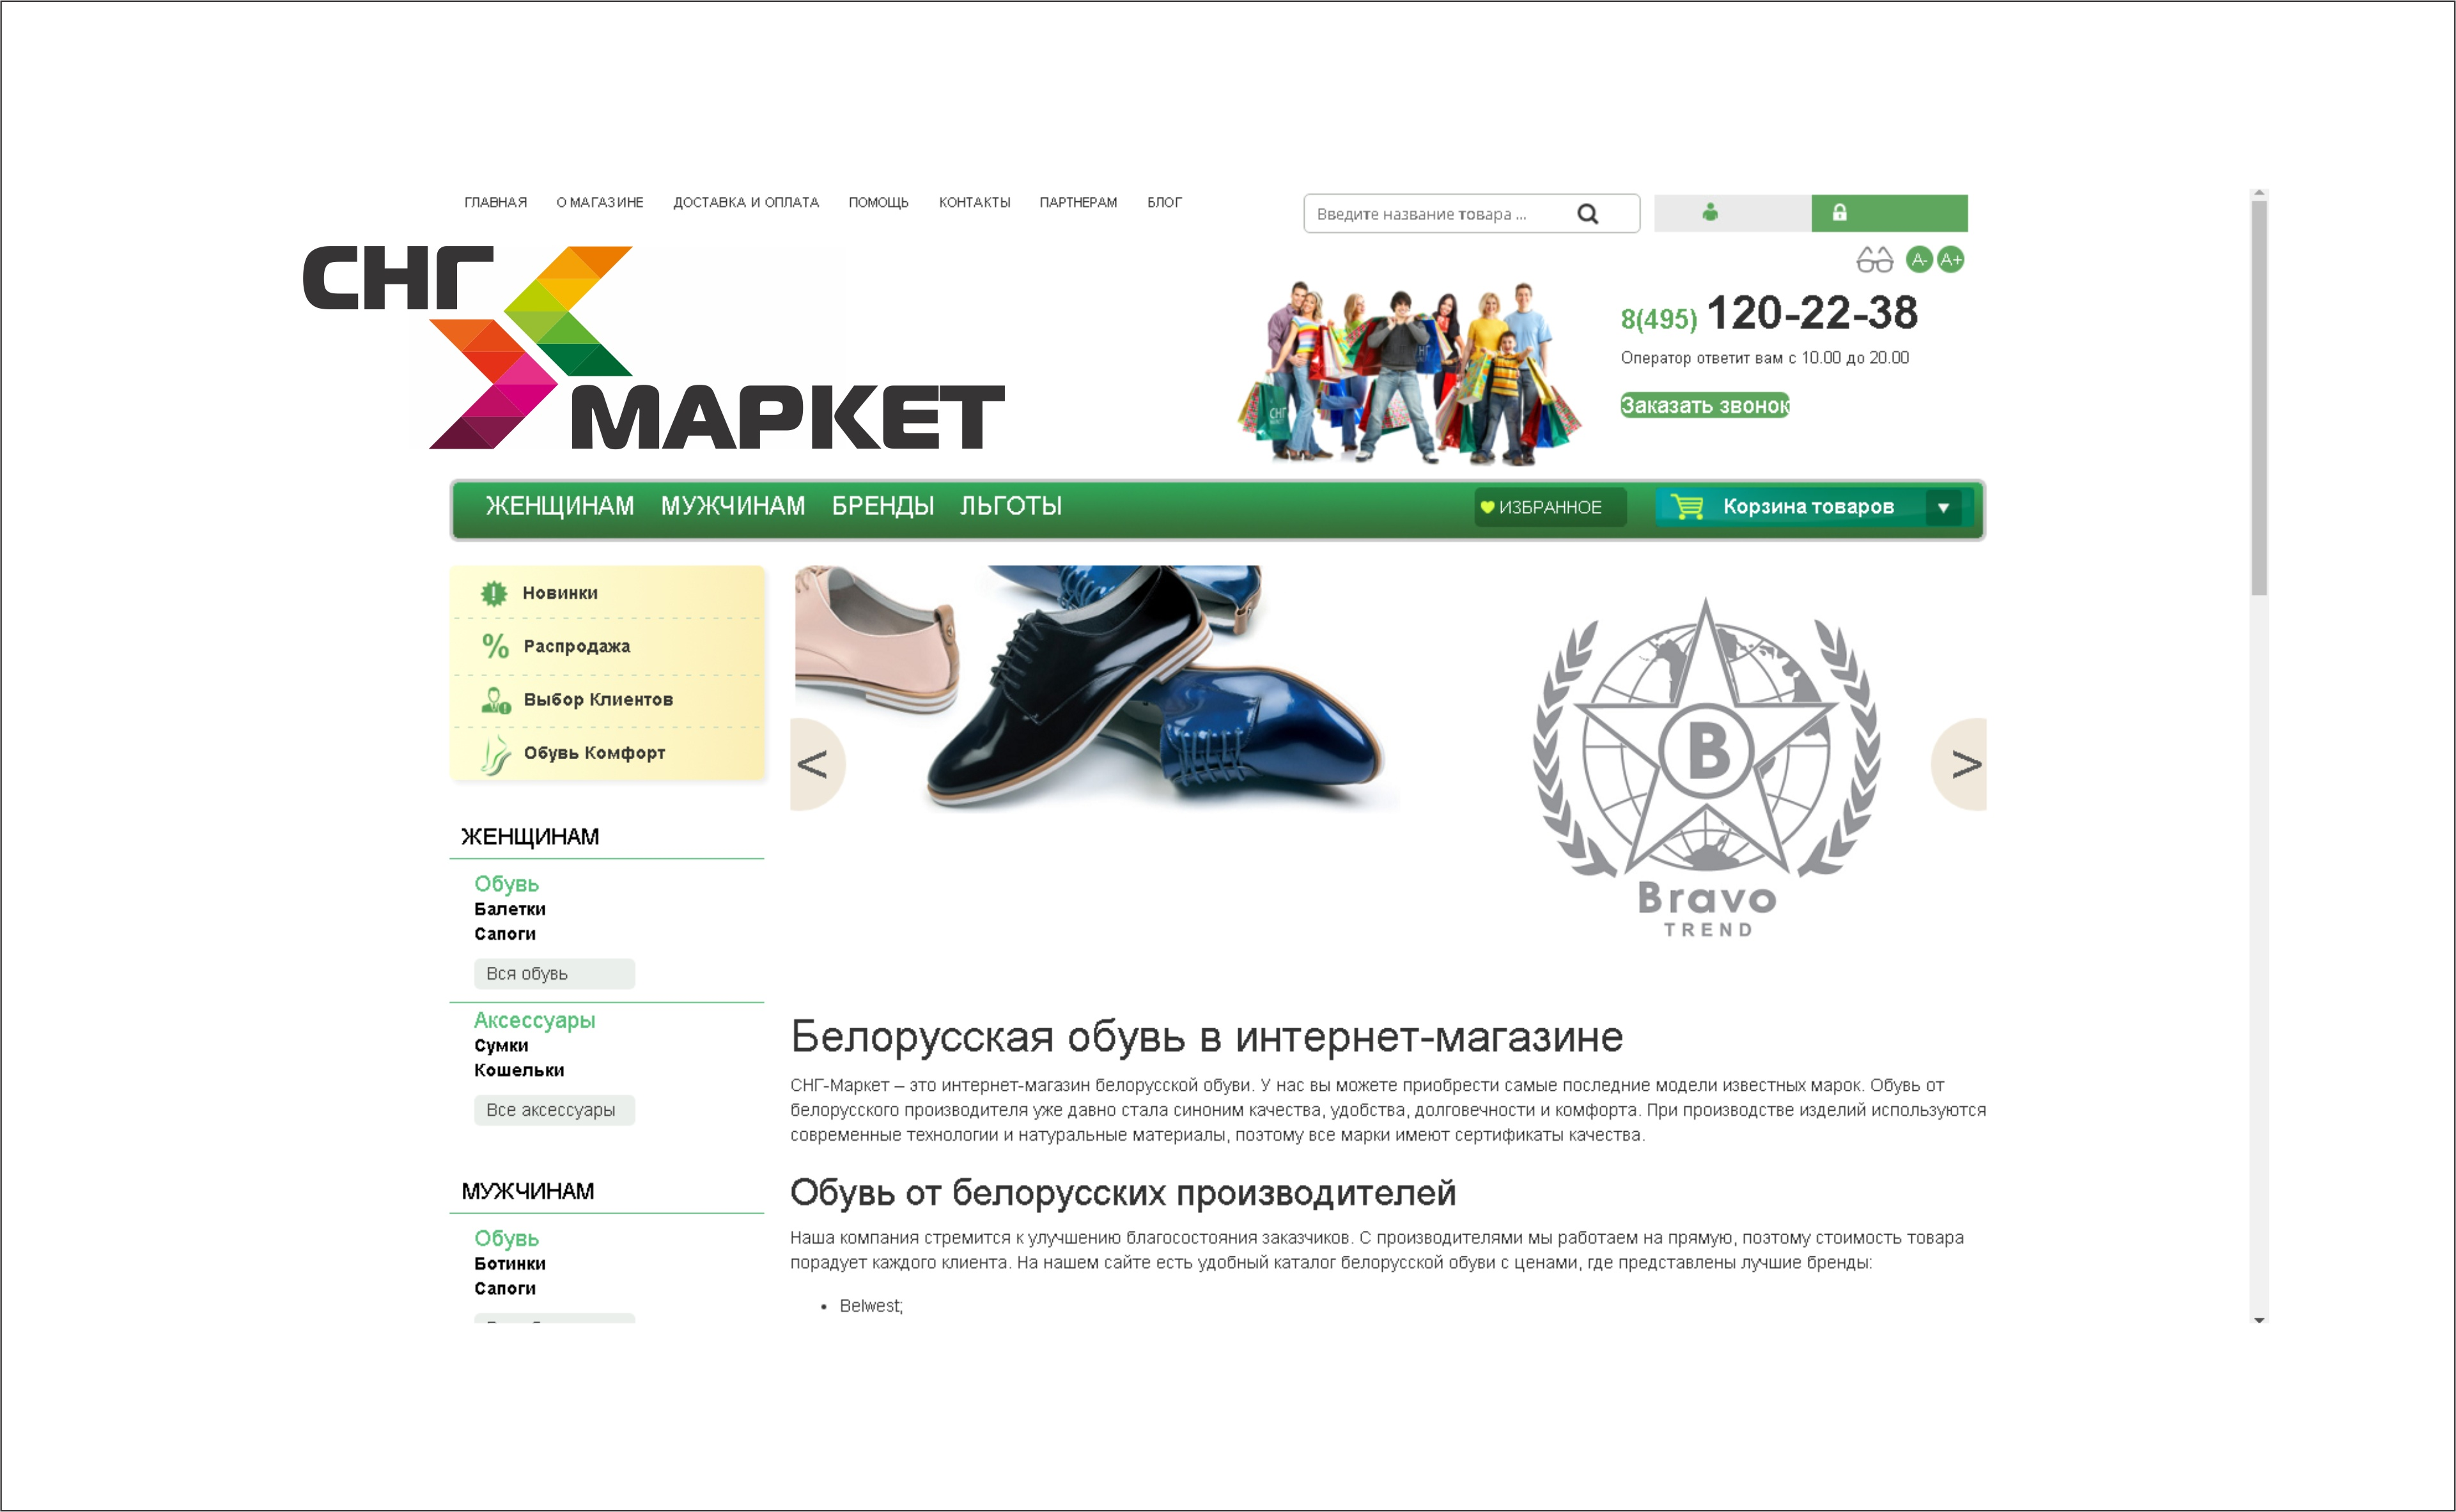 Объявляется конкурс на создание логотипа ИМ обуви фото f_3635a15e3fd2fe6d.jpg